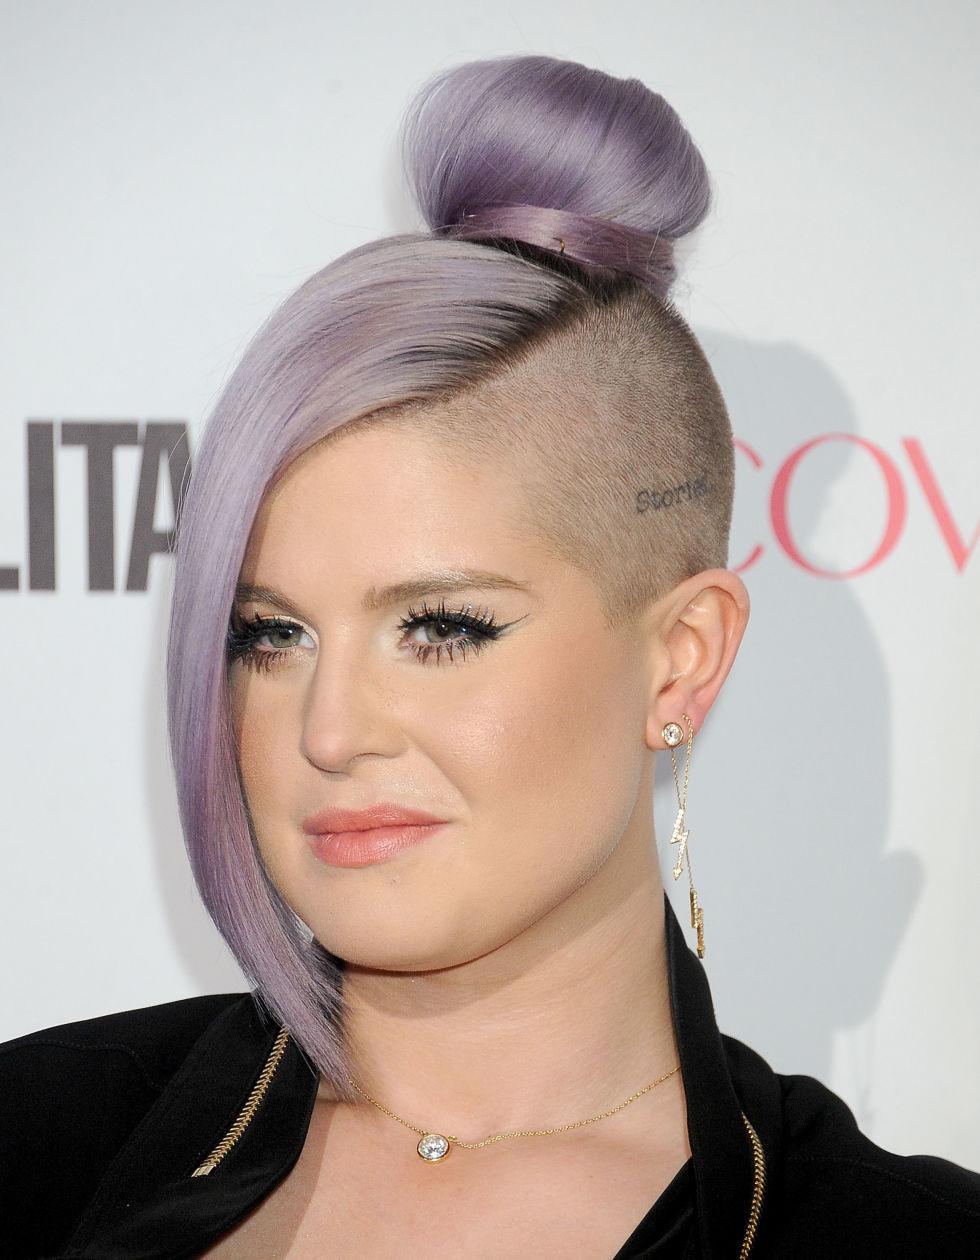 Wondrous Best Top Knot Hairstyles Celebrity Top Knots Short Hairstyles Gunalazisus